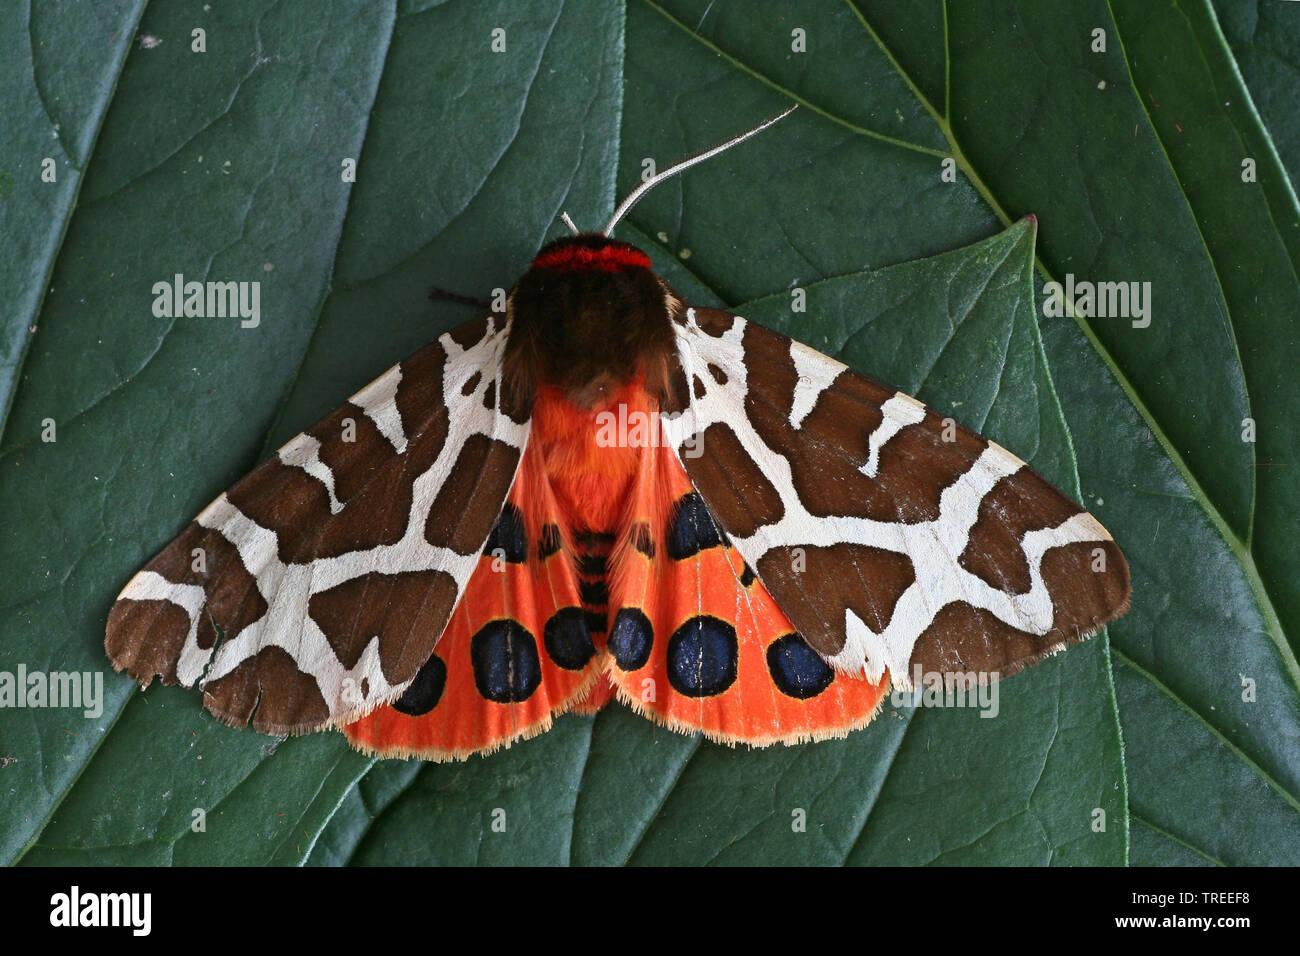 Brauner Baer (Arctia caja), sitzt auf einem Blatt, Niederlande | Garden tiger moth, Great tiger moth (Arctia caja), sits on a leaf, Netherlands | BLWS - Stock Image